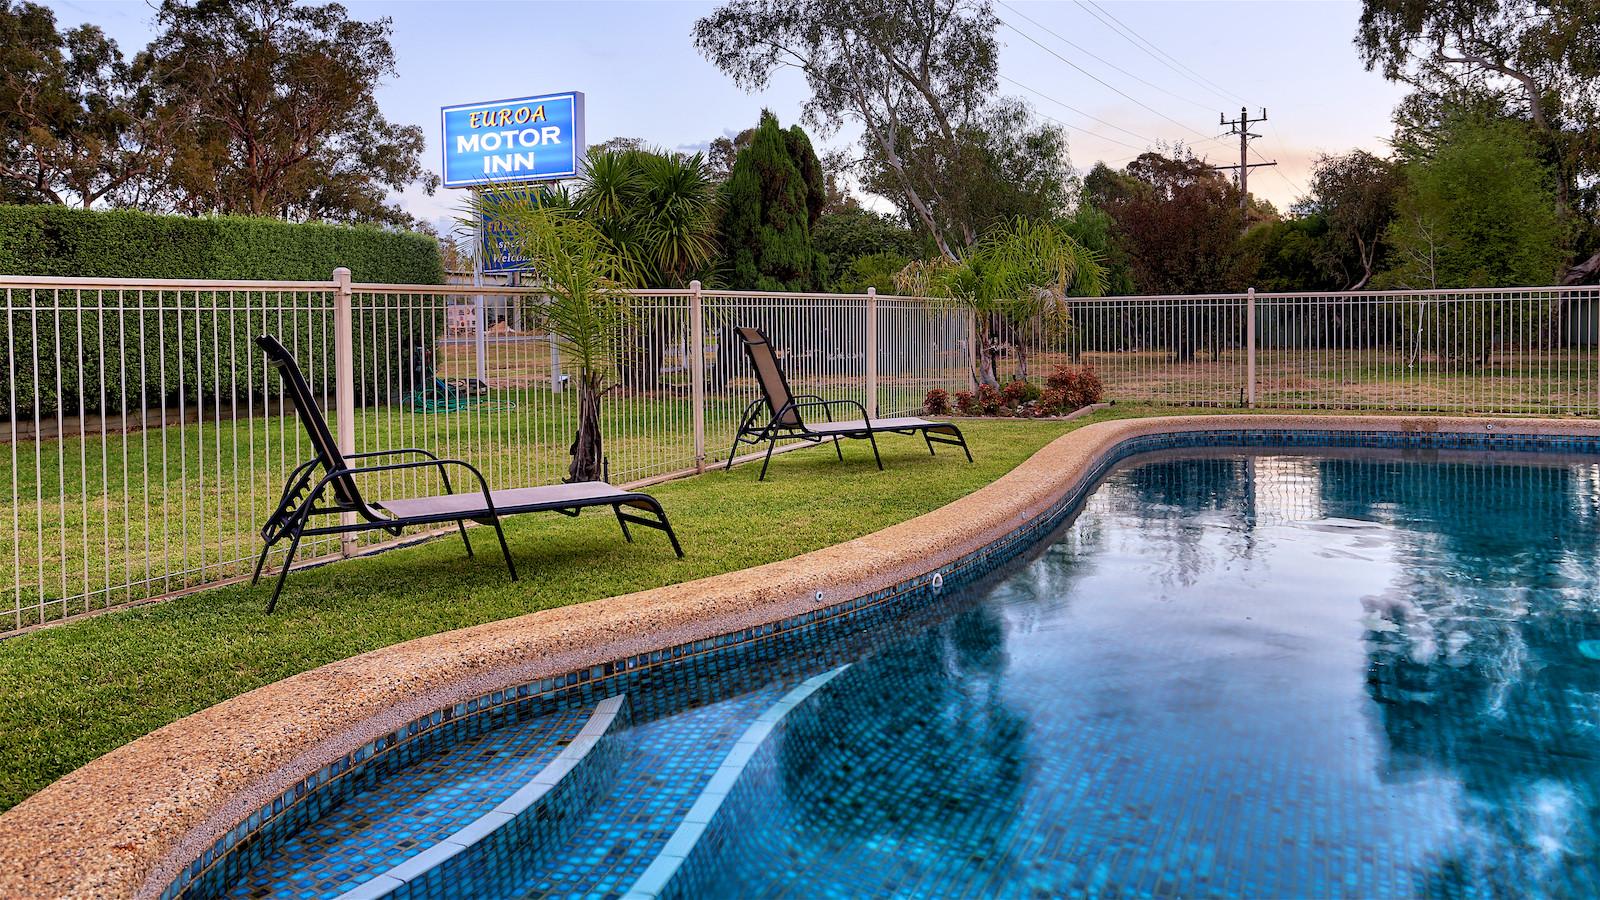 Euroa Motor Inn Swimming Pool